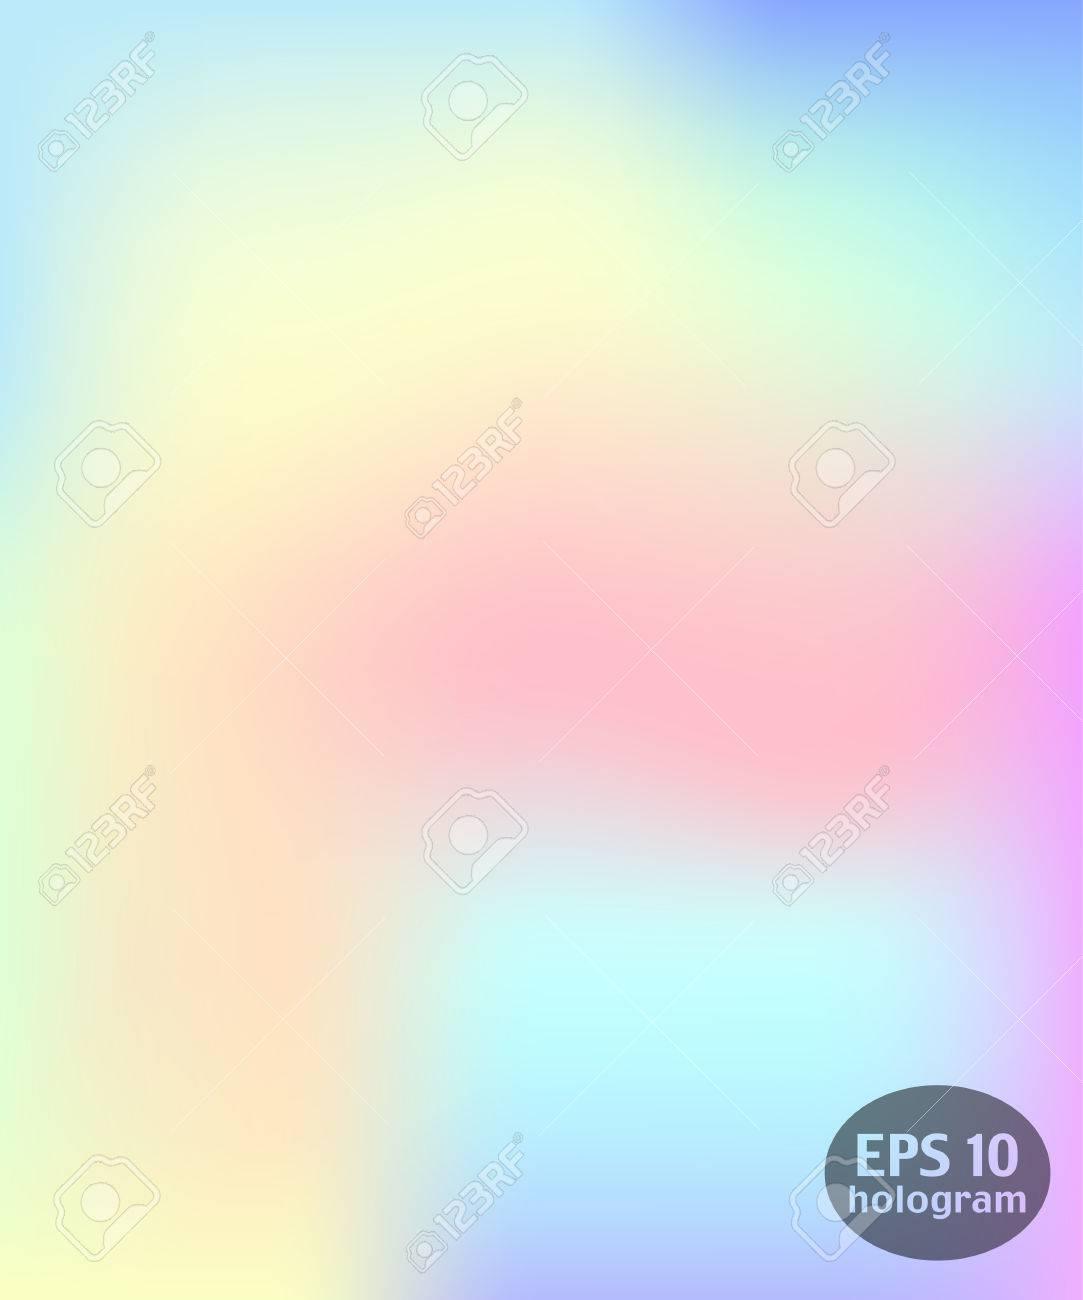 Hologram colorful background trendy modern design for print hologram colorful background trendy modern design for print web design filling silhouettes or kristyandbryce Gallery